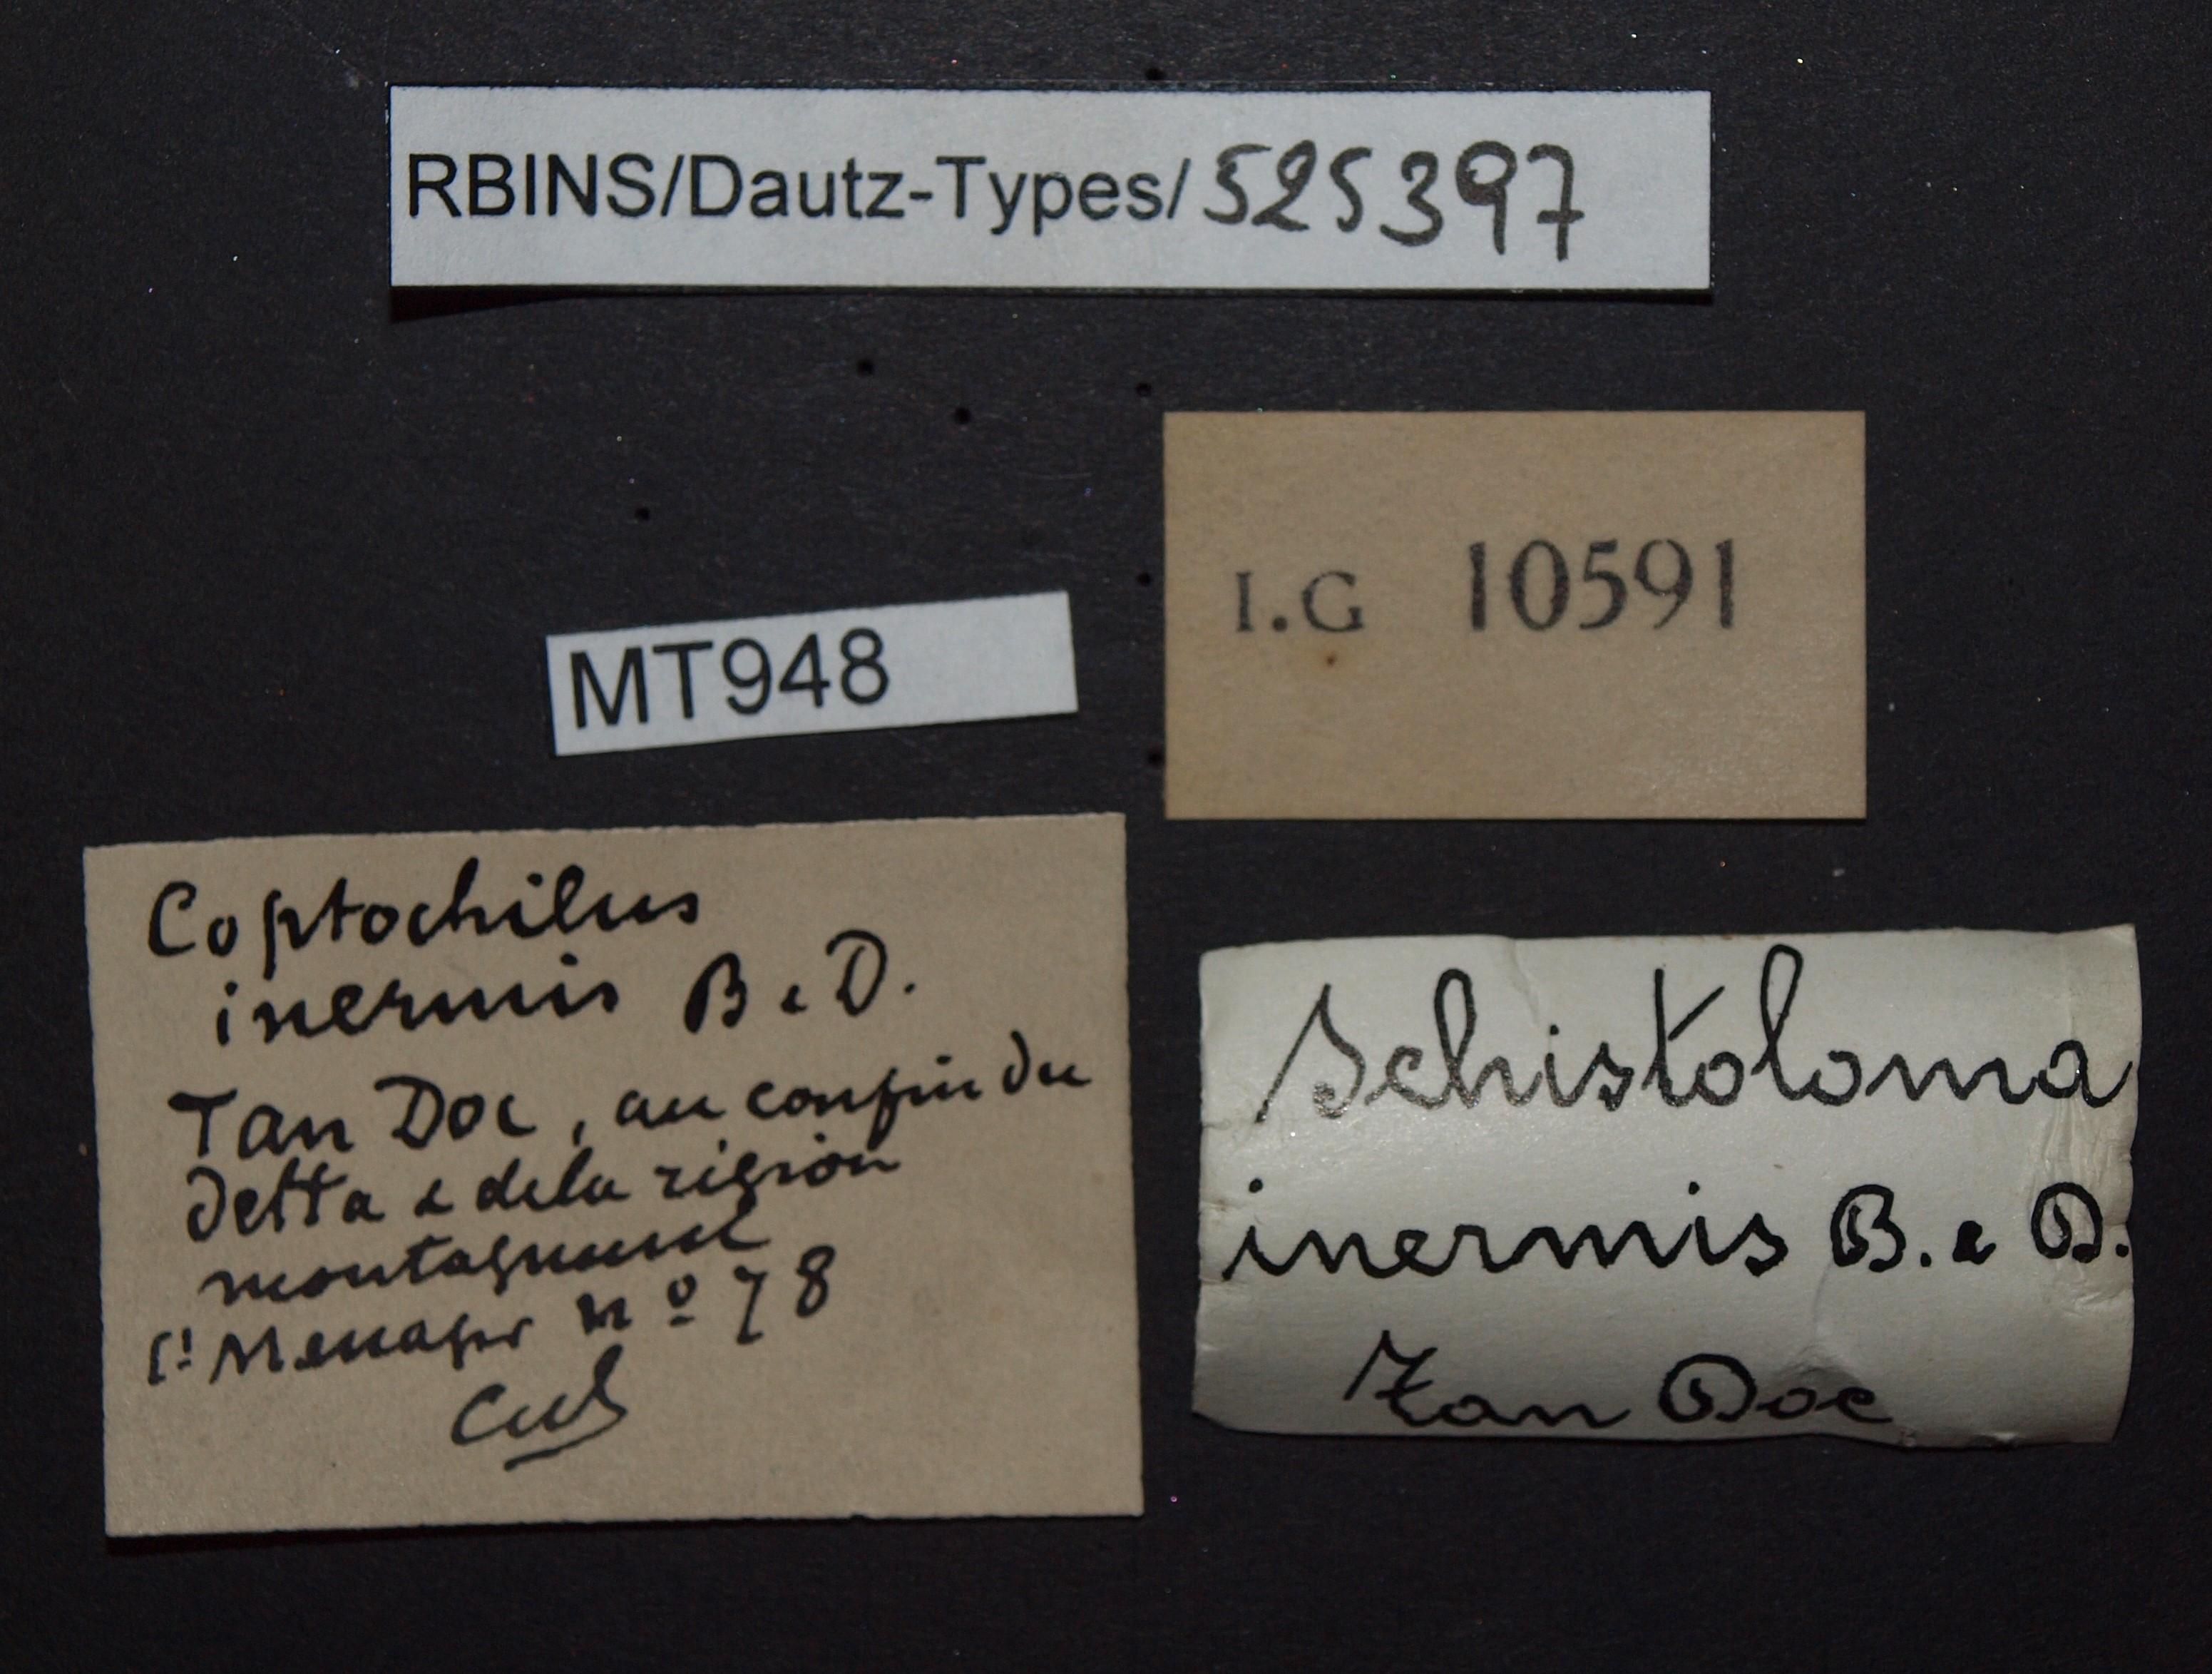 BE-RBINS-INV MT 948 Coptocheilus inermis pt Lb.JPG